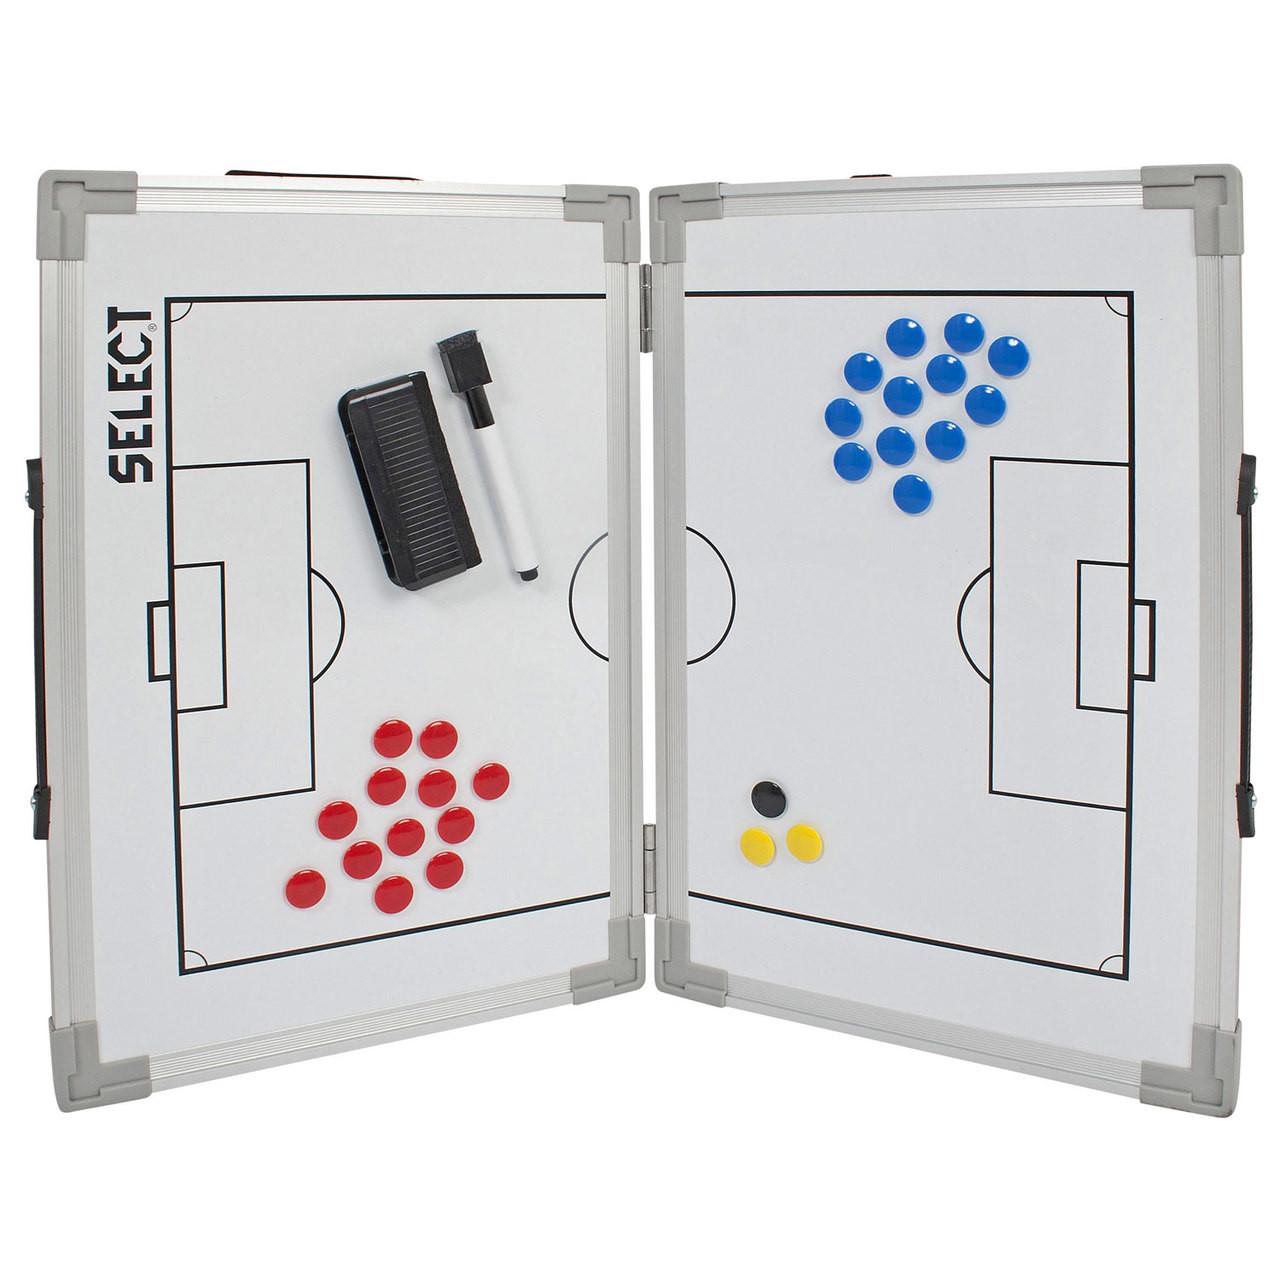 Select Foldable Soccer Tactics Coaches Board